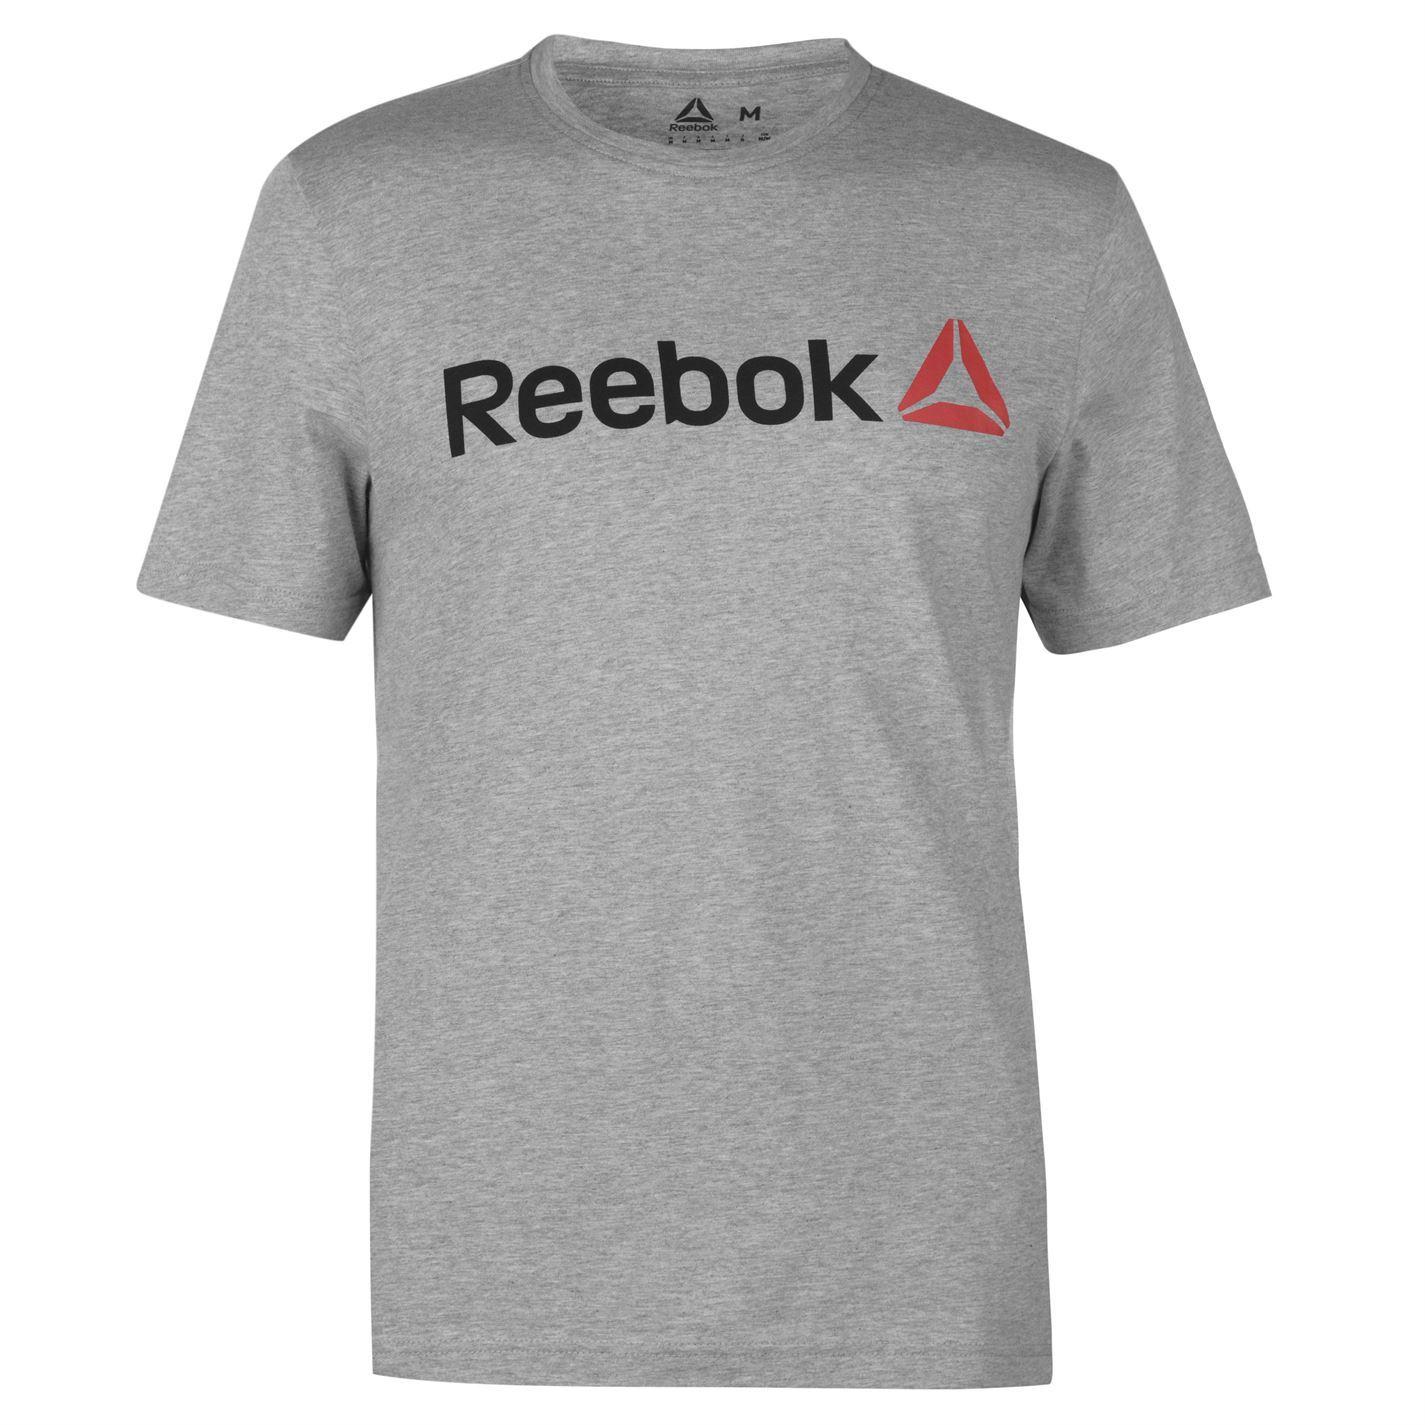 Reebok-Delta-Logo-T-Shirt-Mens-Tee-Shirt-Top thumbnail 23